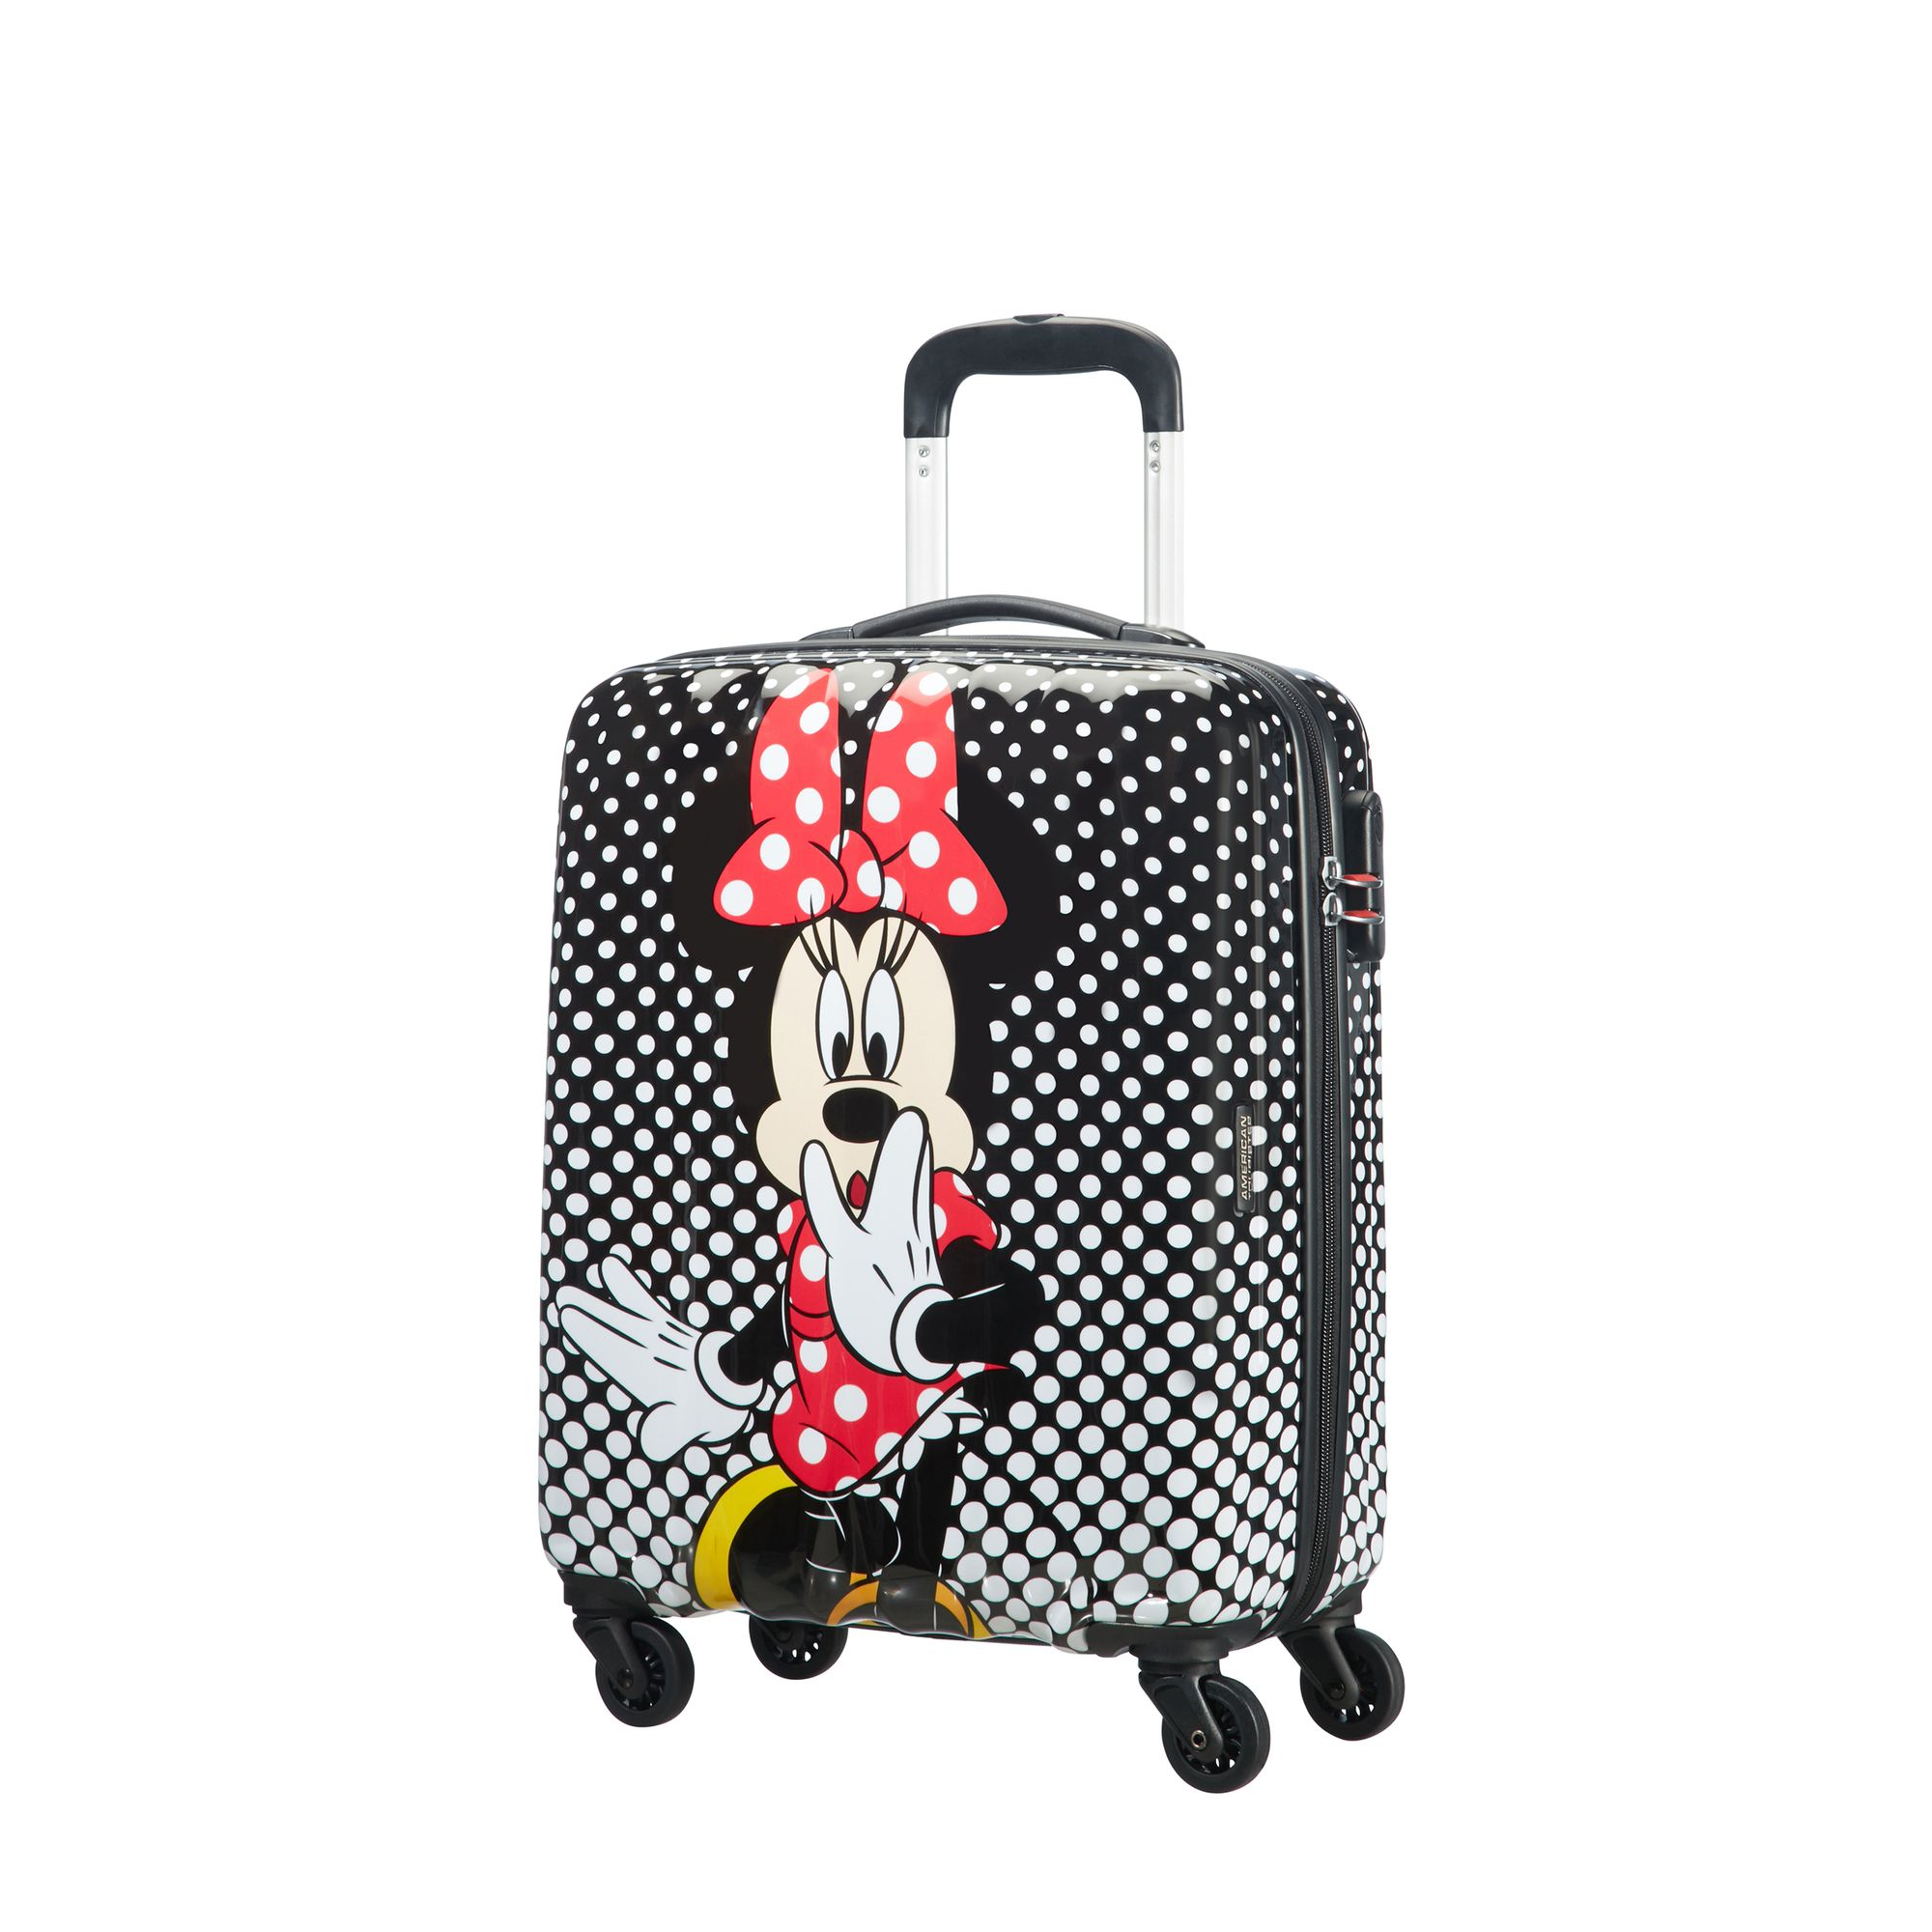 American Tourister Disney Legends Mimmi Pigg resväska, 55 cm, Svart med mönster